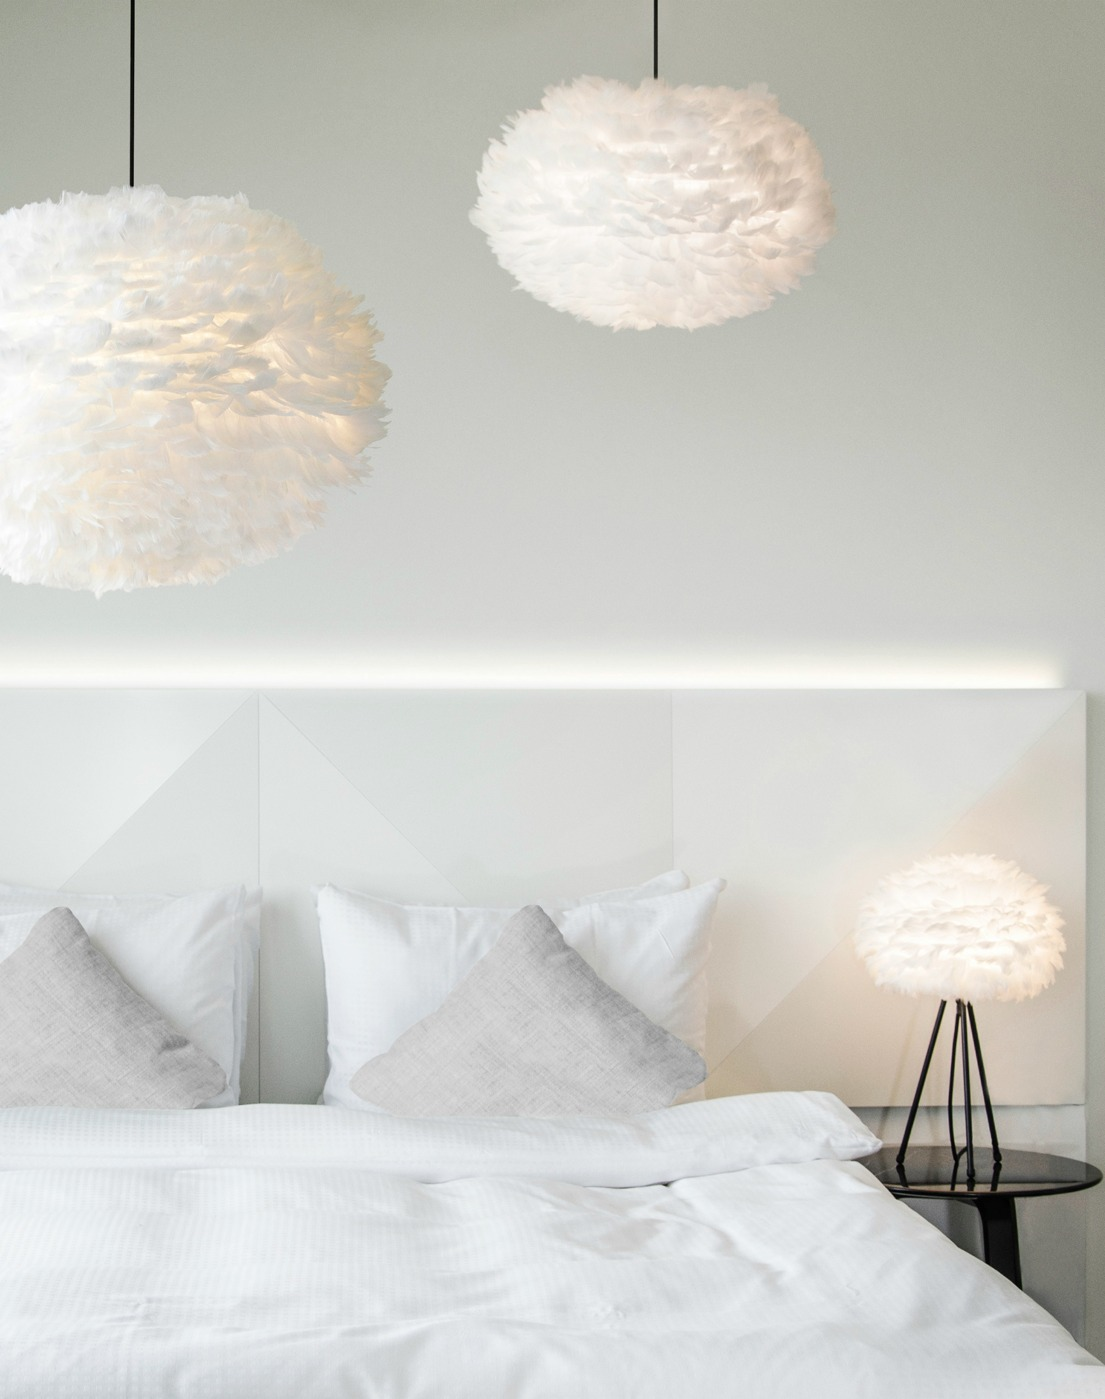 eos-large-fjaderlampa-dunlampa-taklampa-lampskarm-dansk-design-inredning-belysning-brunnsboden